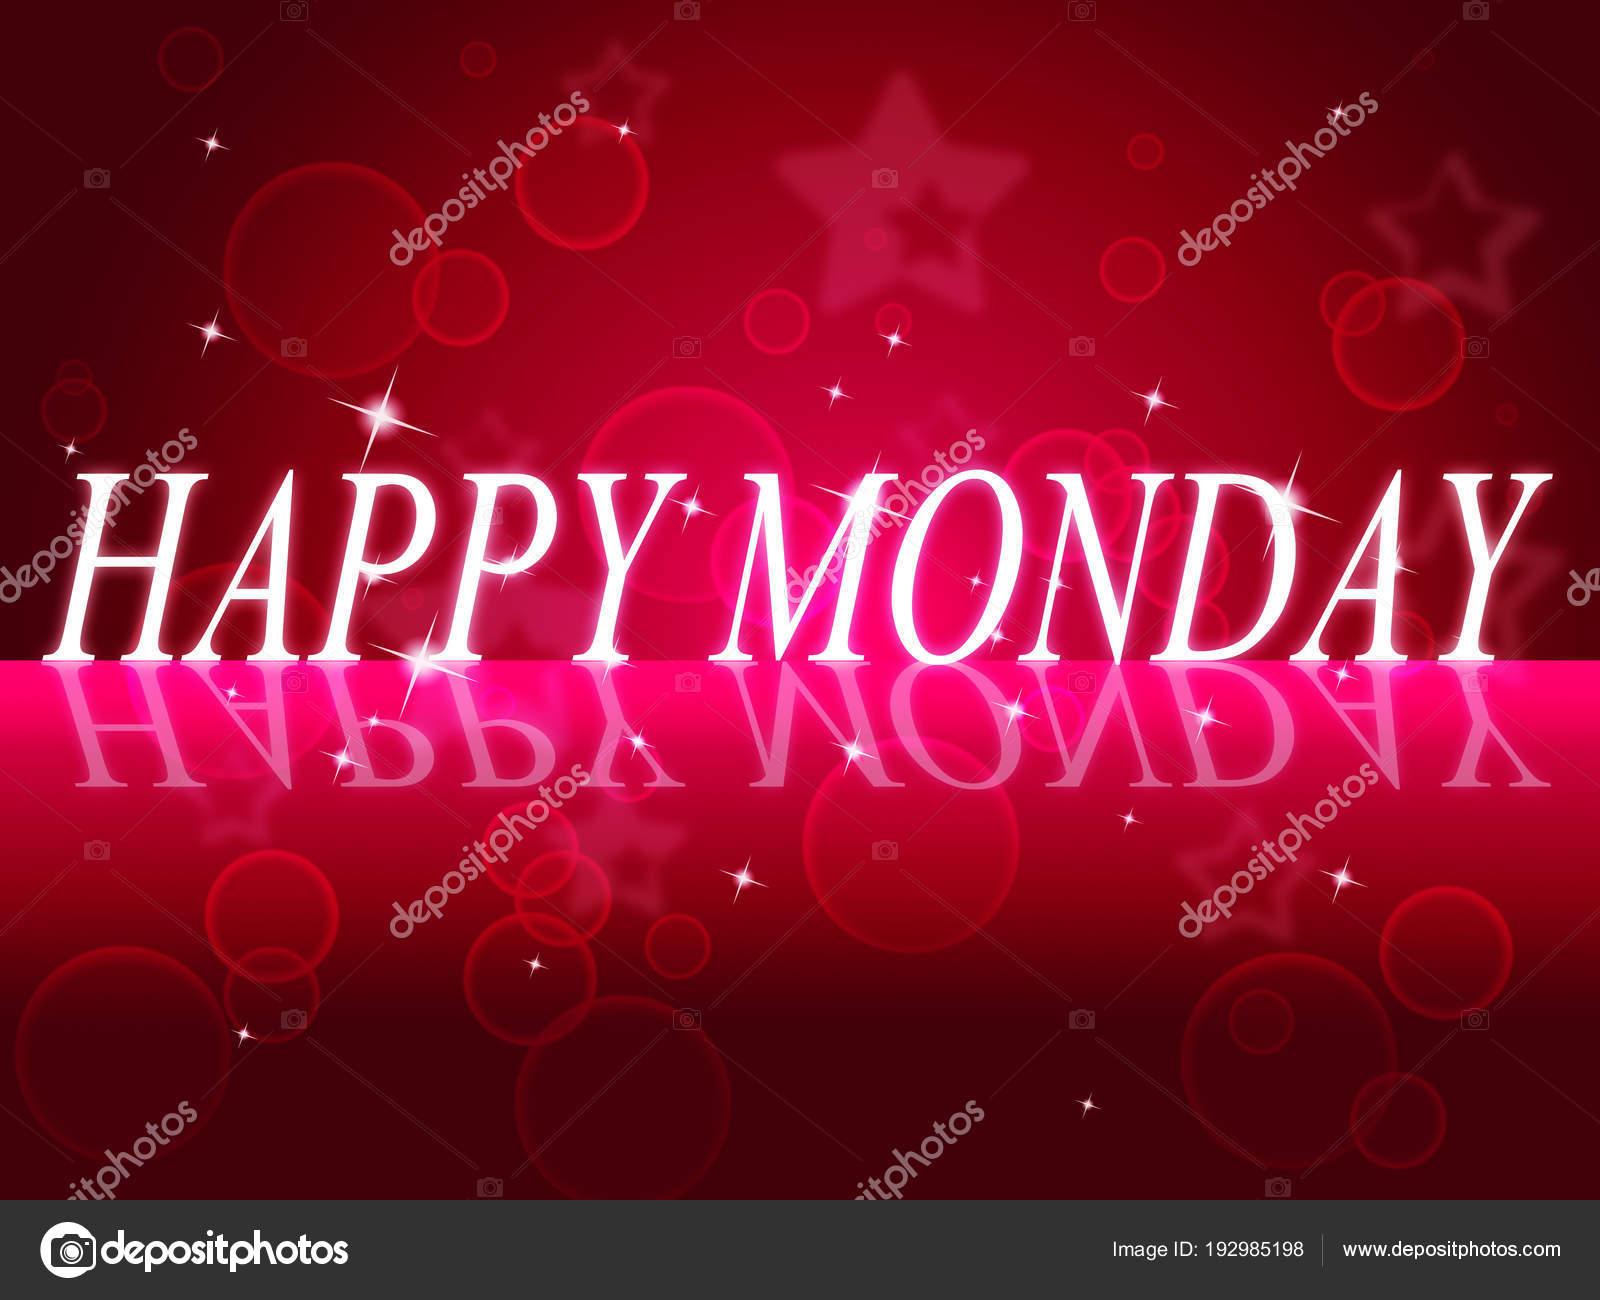 Happy Monday Quotes Motivation Saying 3d Illustration Stock